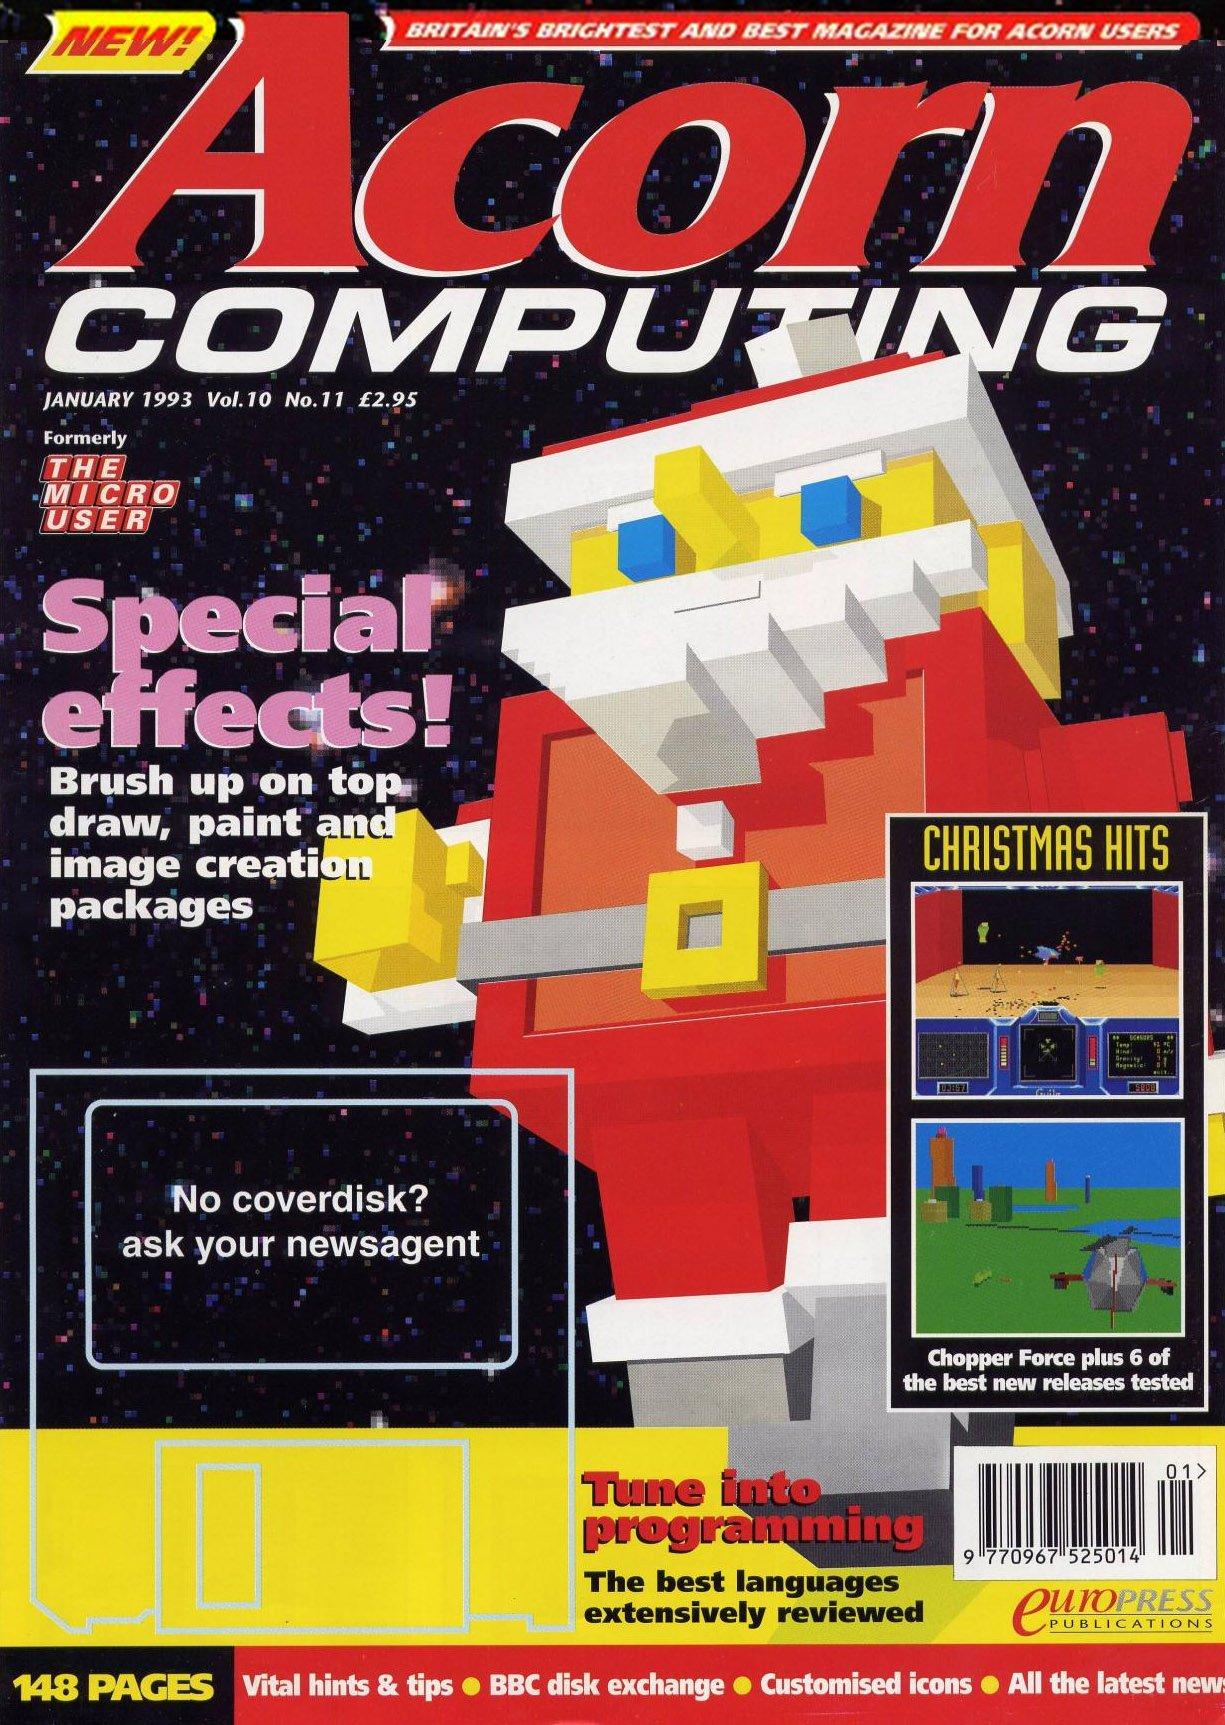 Acorn Computing Vol.10 No.11 (January 1993)